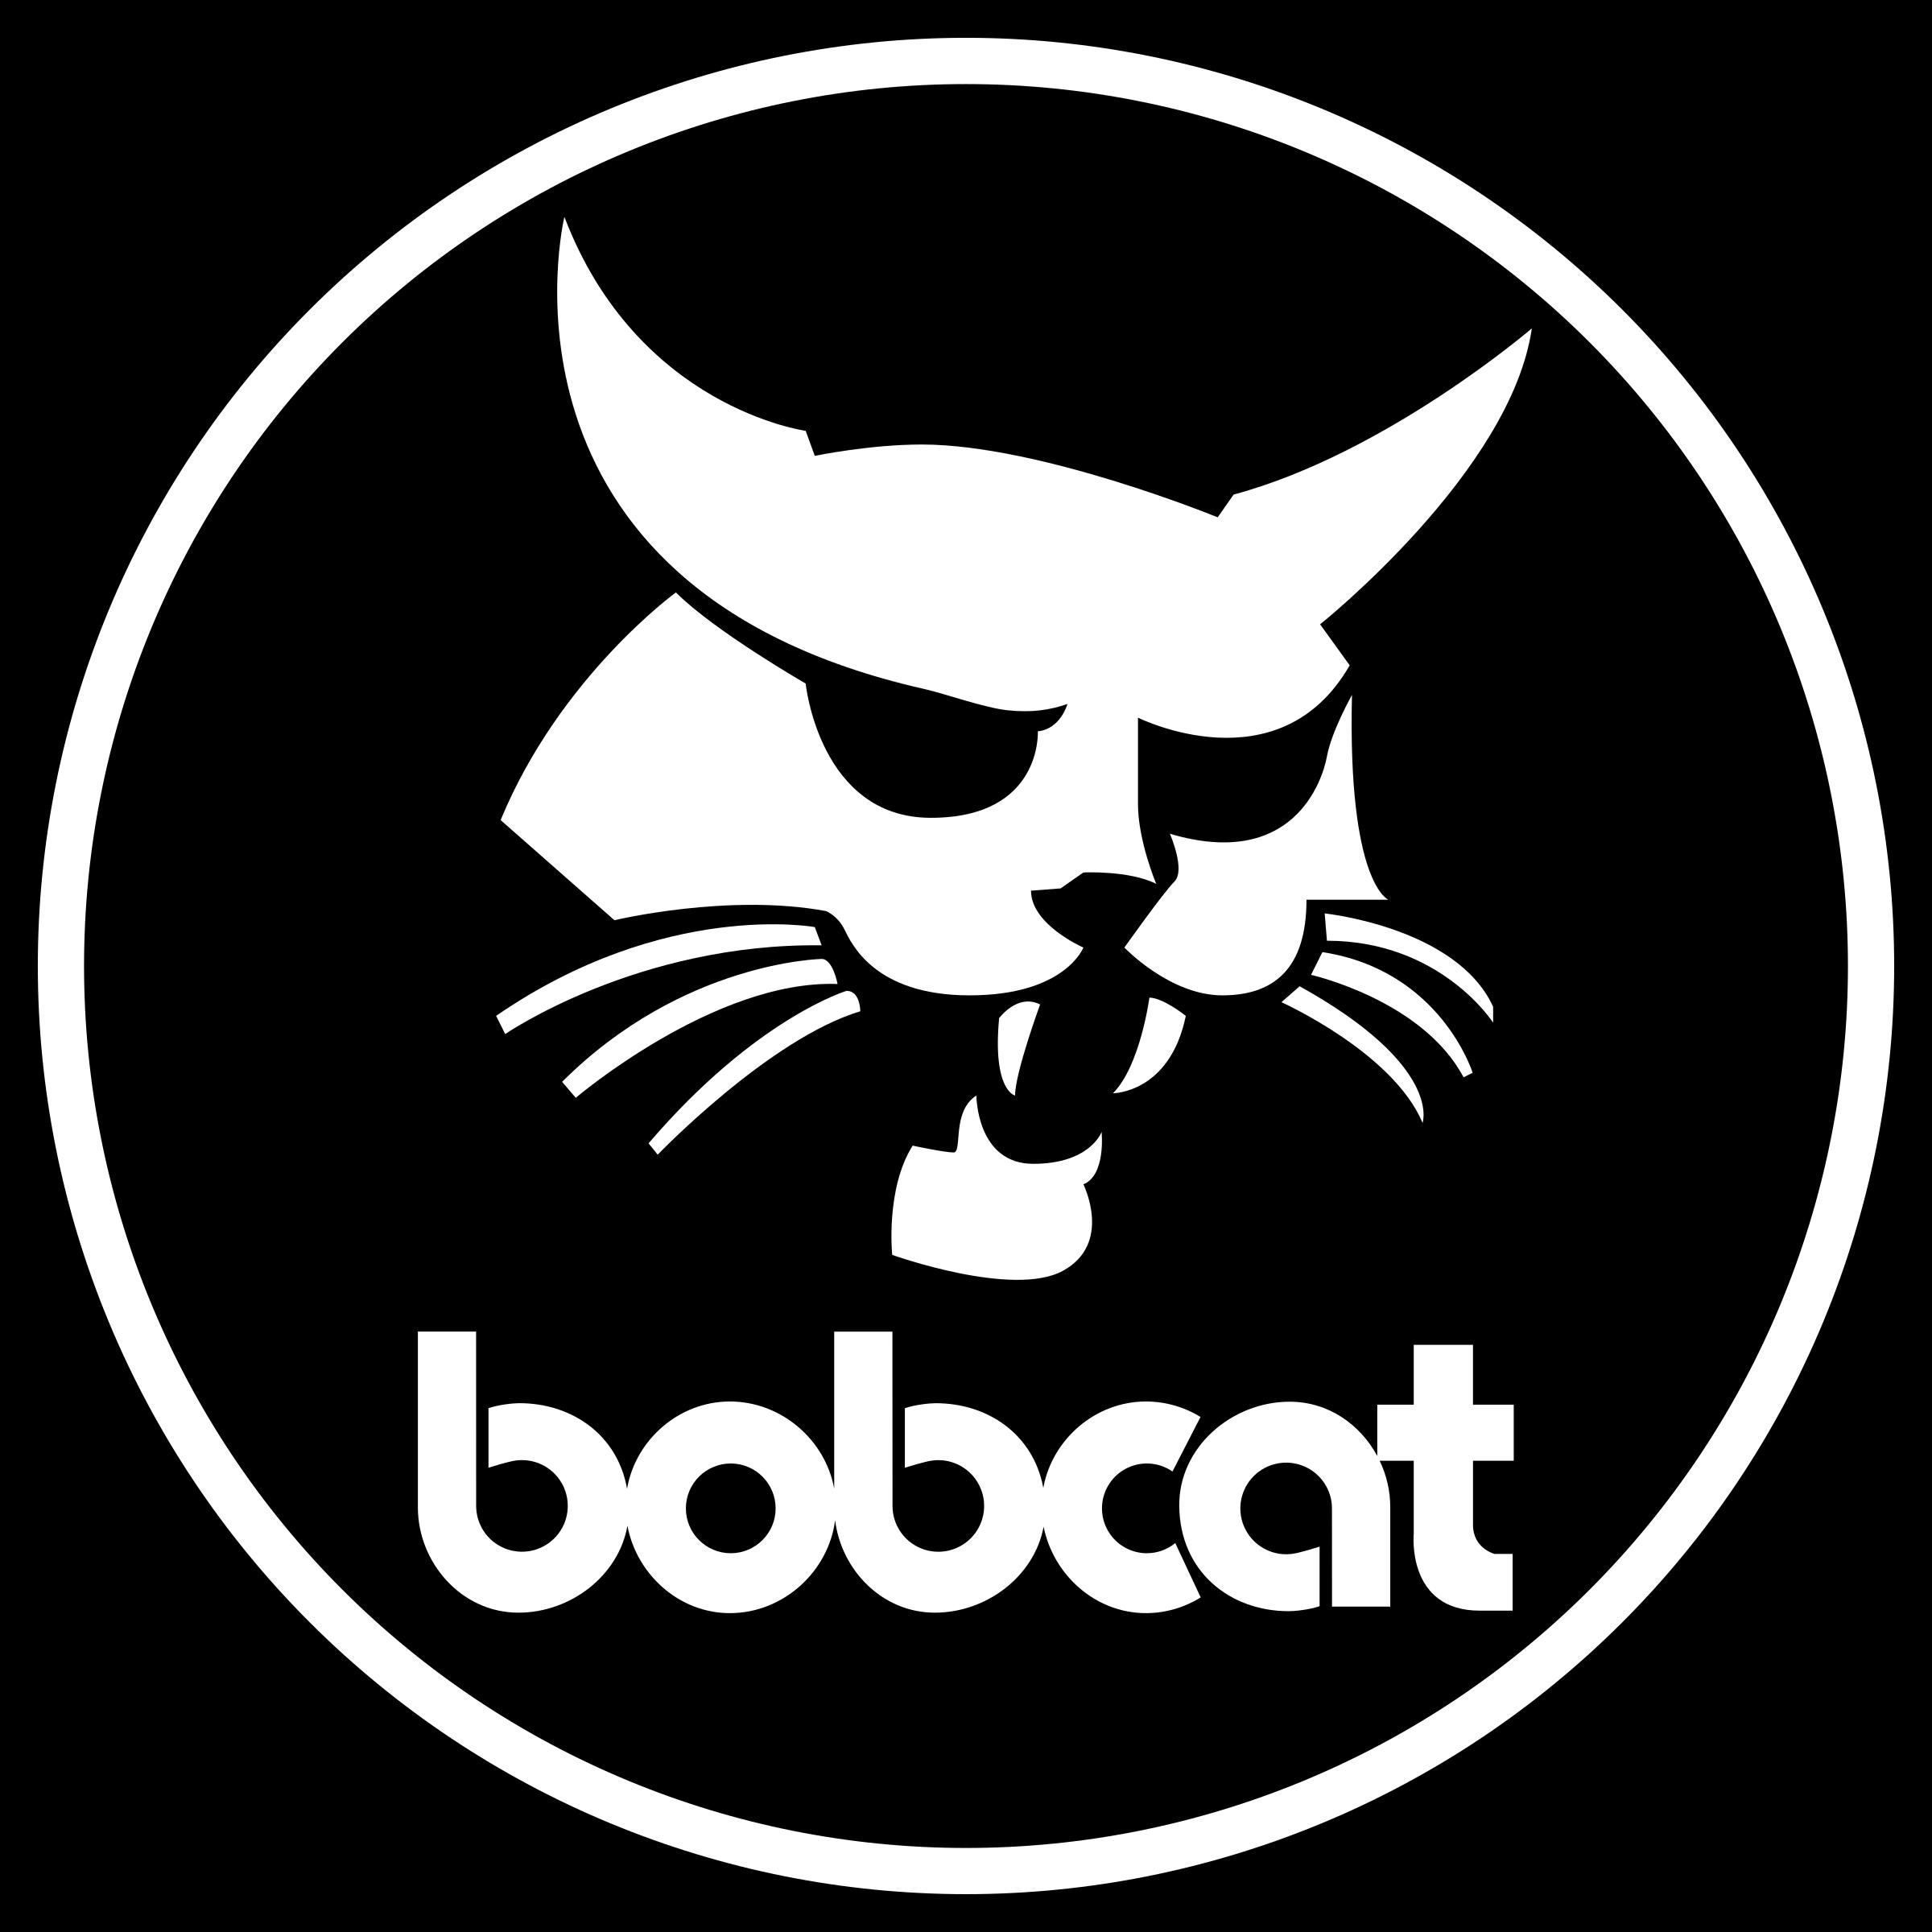 Bobcat 4 Logo Png Transparent Svg Vector Freebie Supply